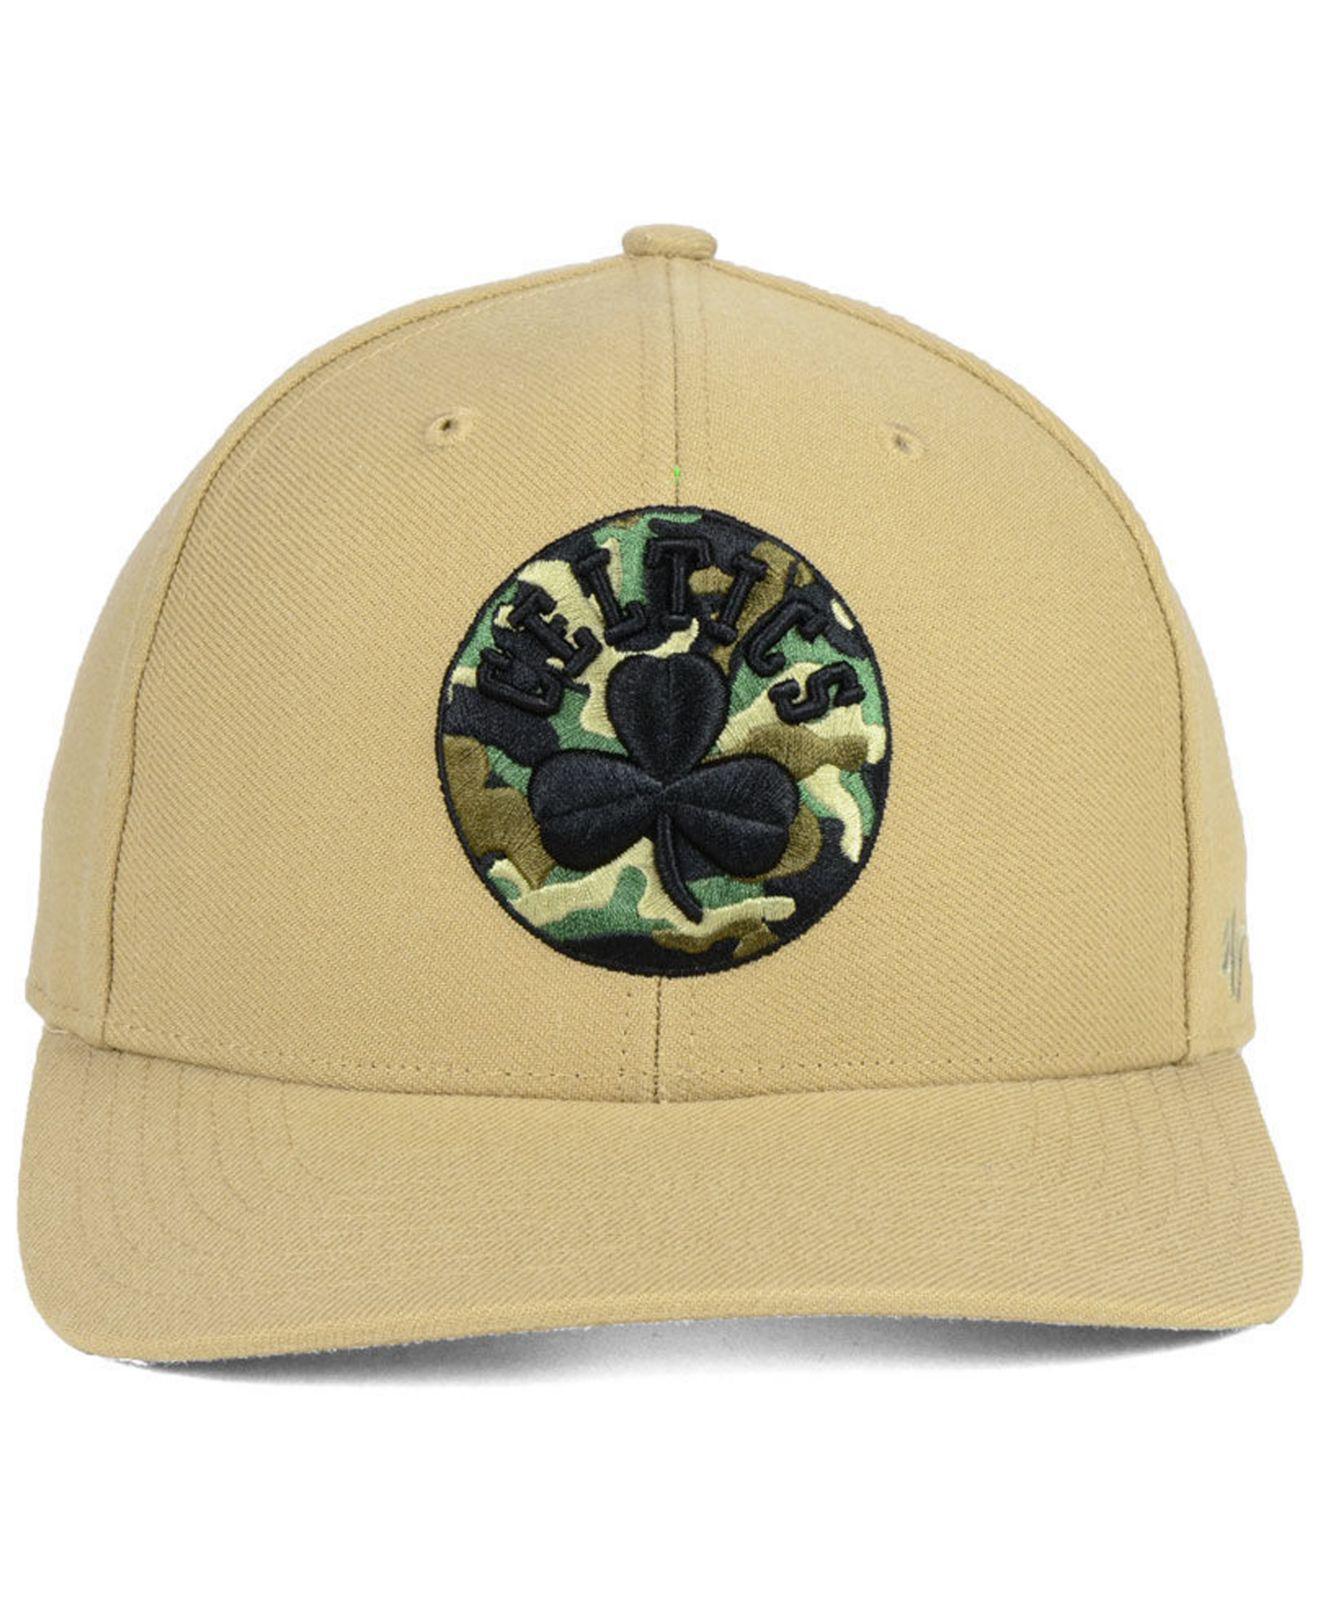 meet c8c26 d5849 spain lyst 47 brand boston celtics camfill mvp cap for men 6d41f fd5f9